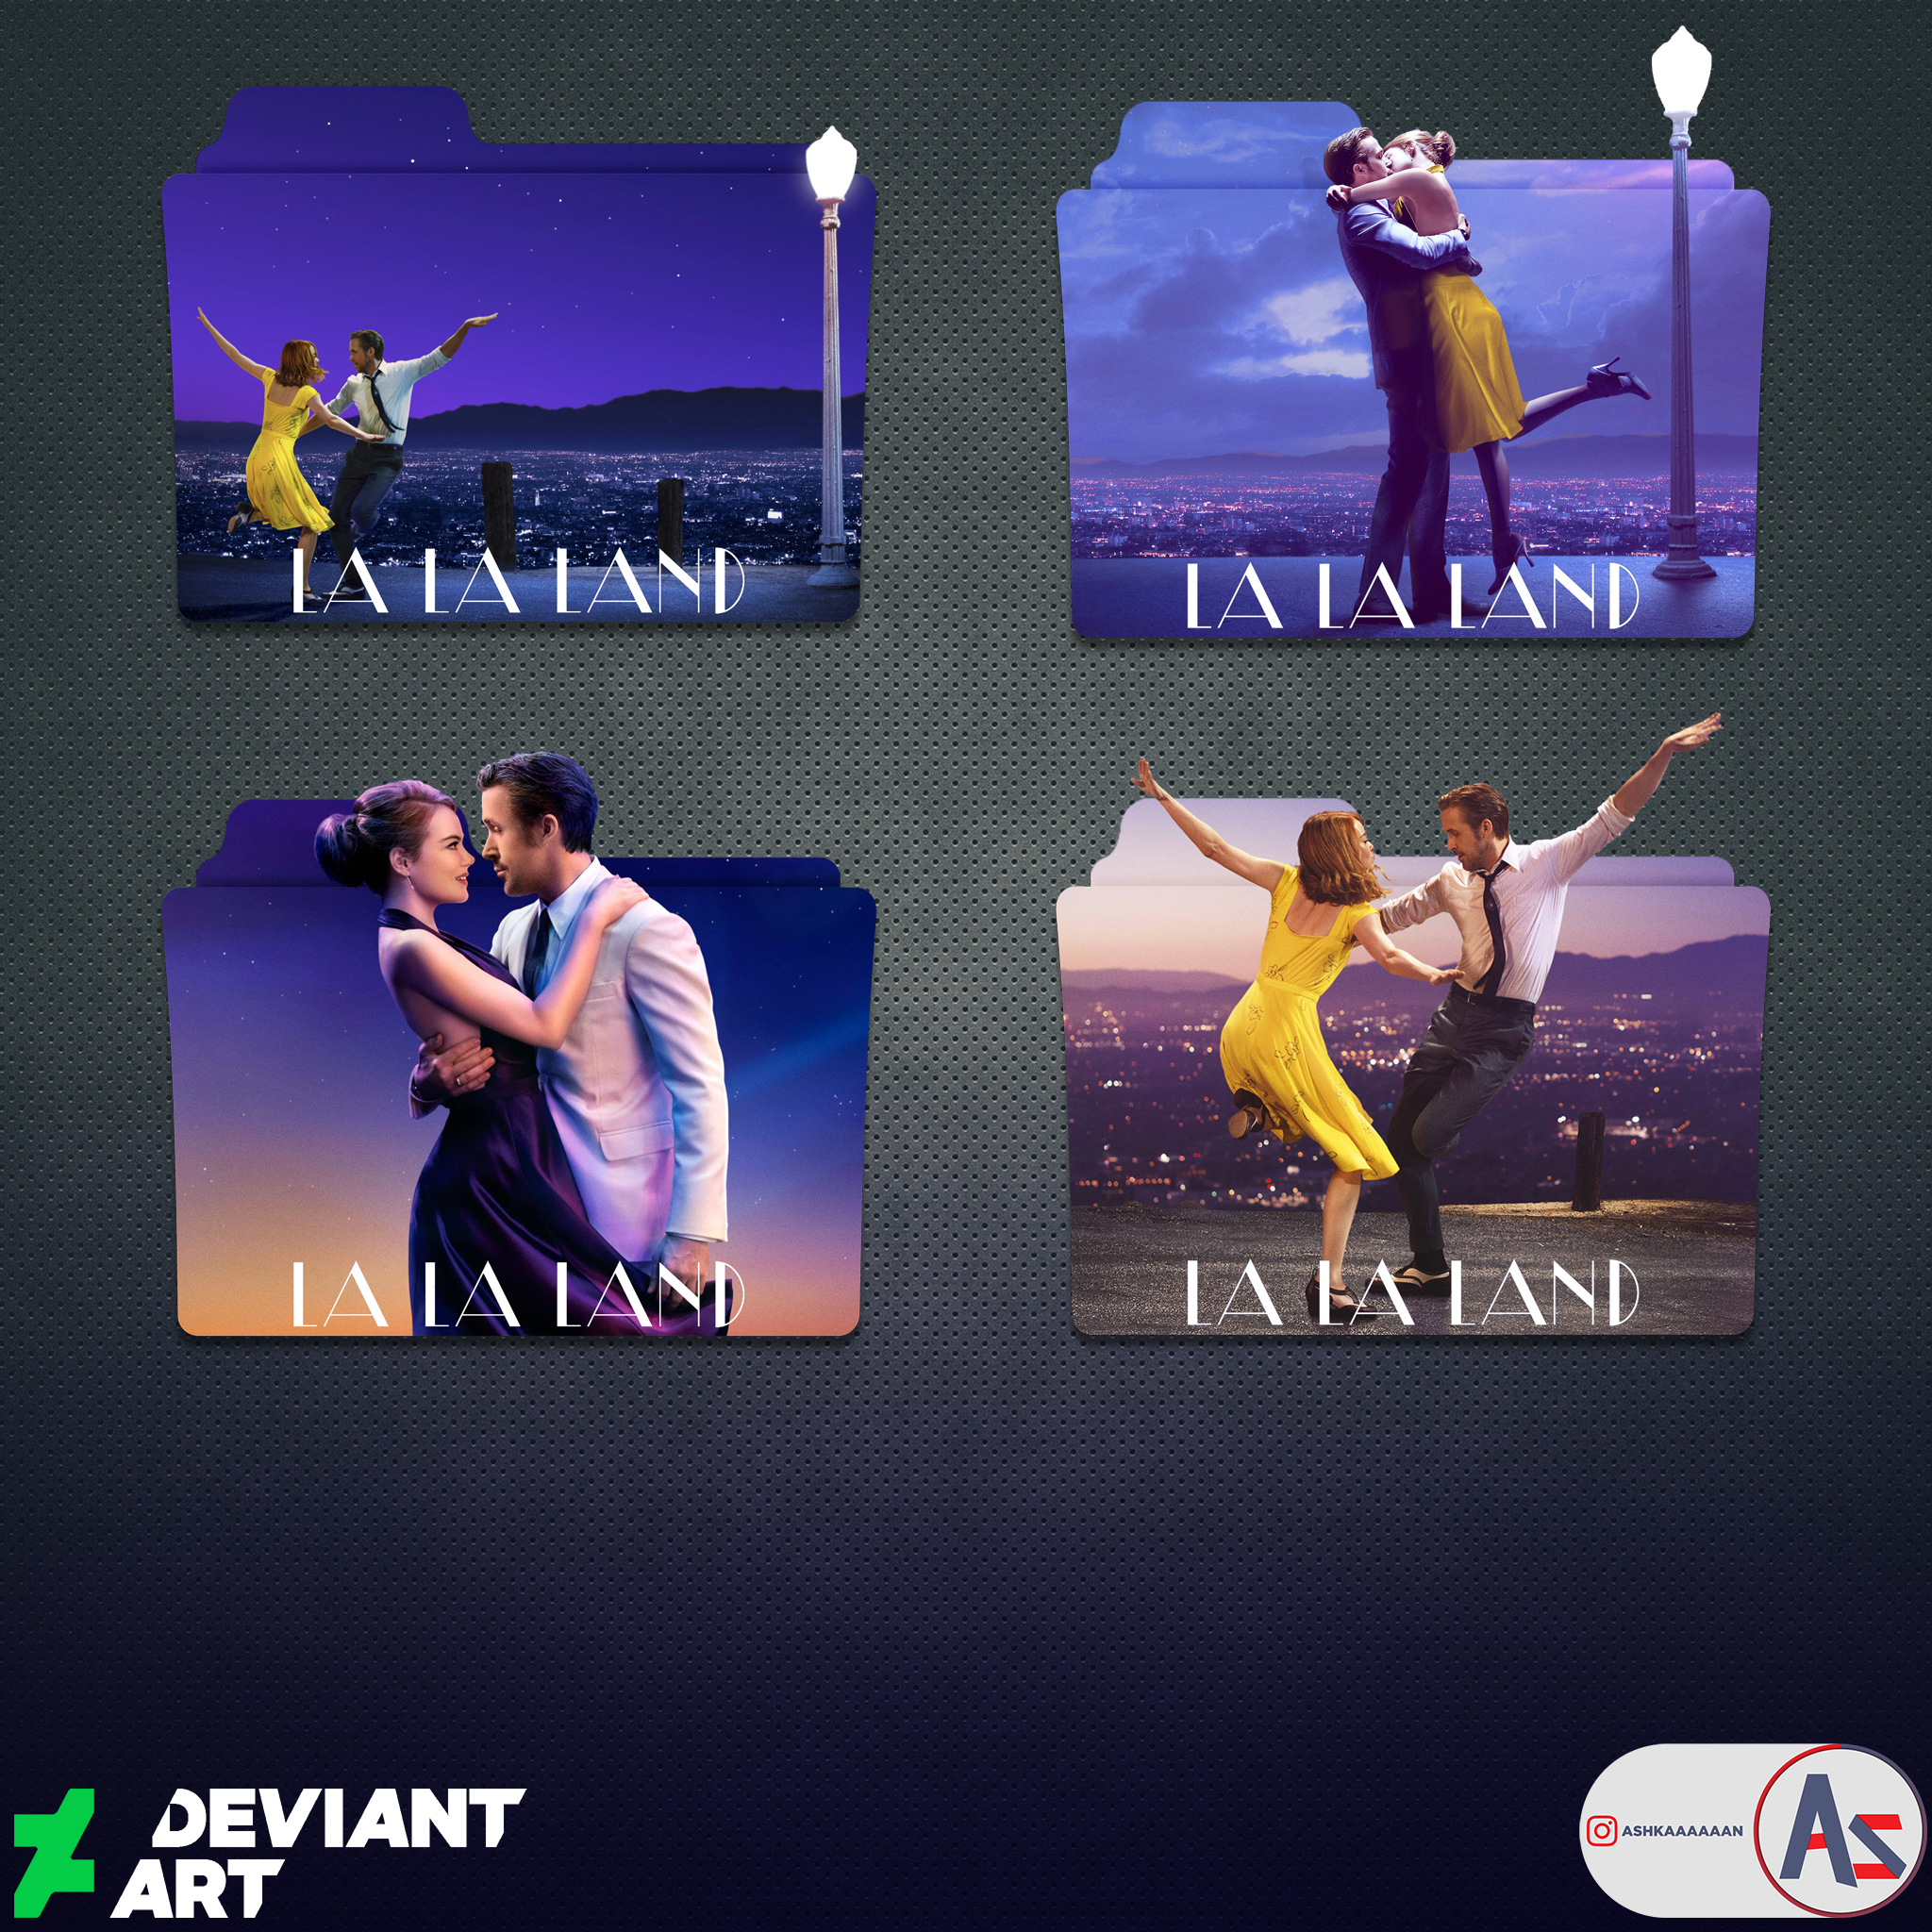 La La Land 2016 Folder Icon Pack By Ashkaaaaaan On Deviantart